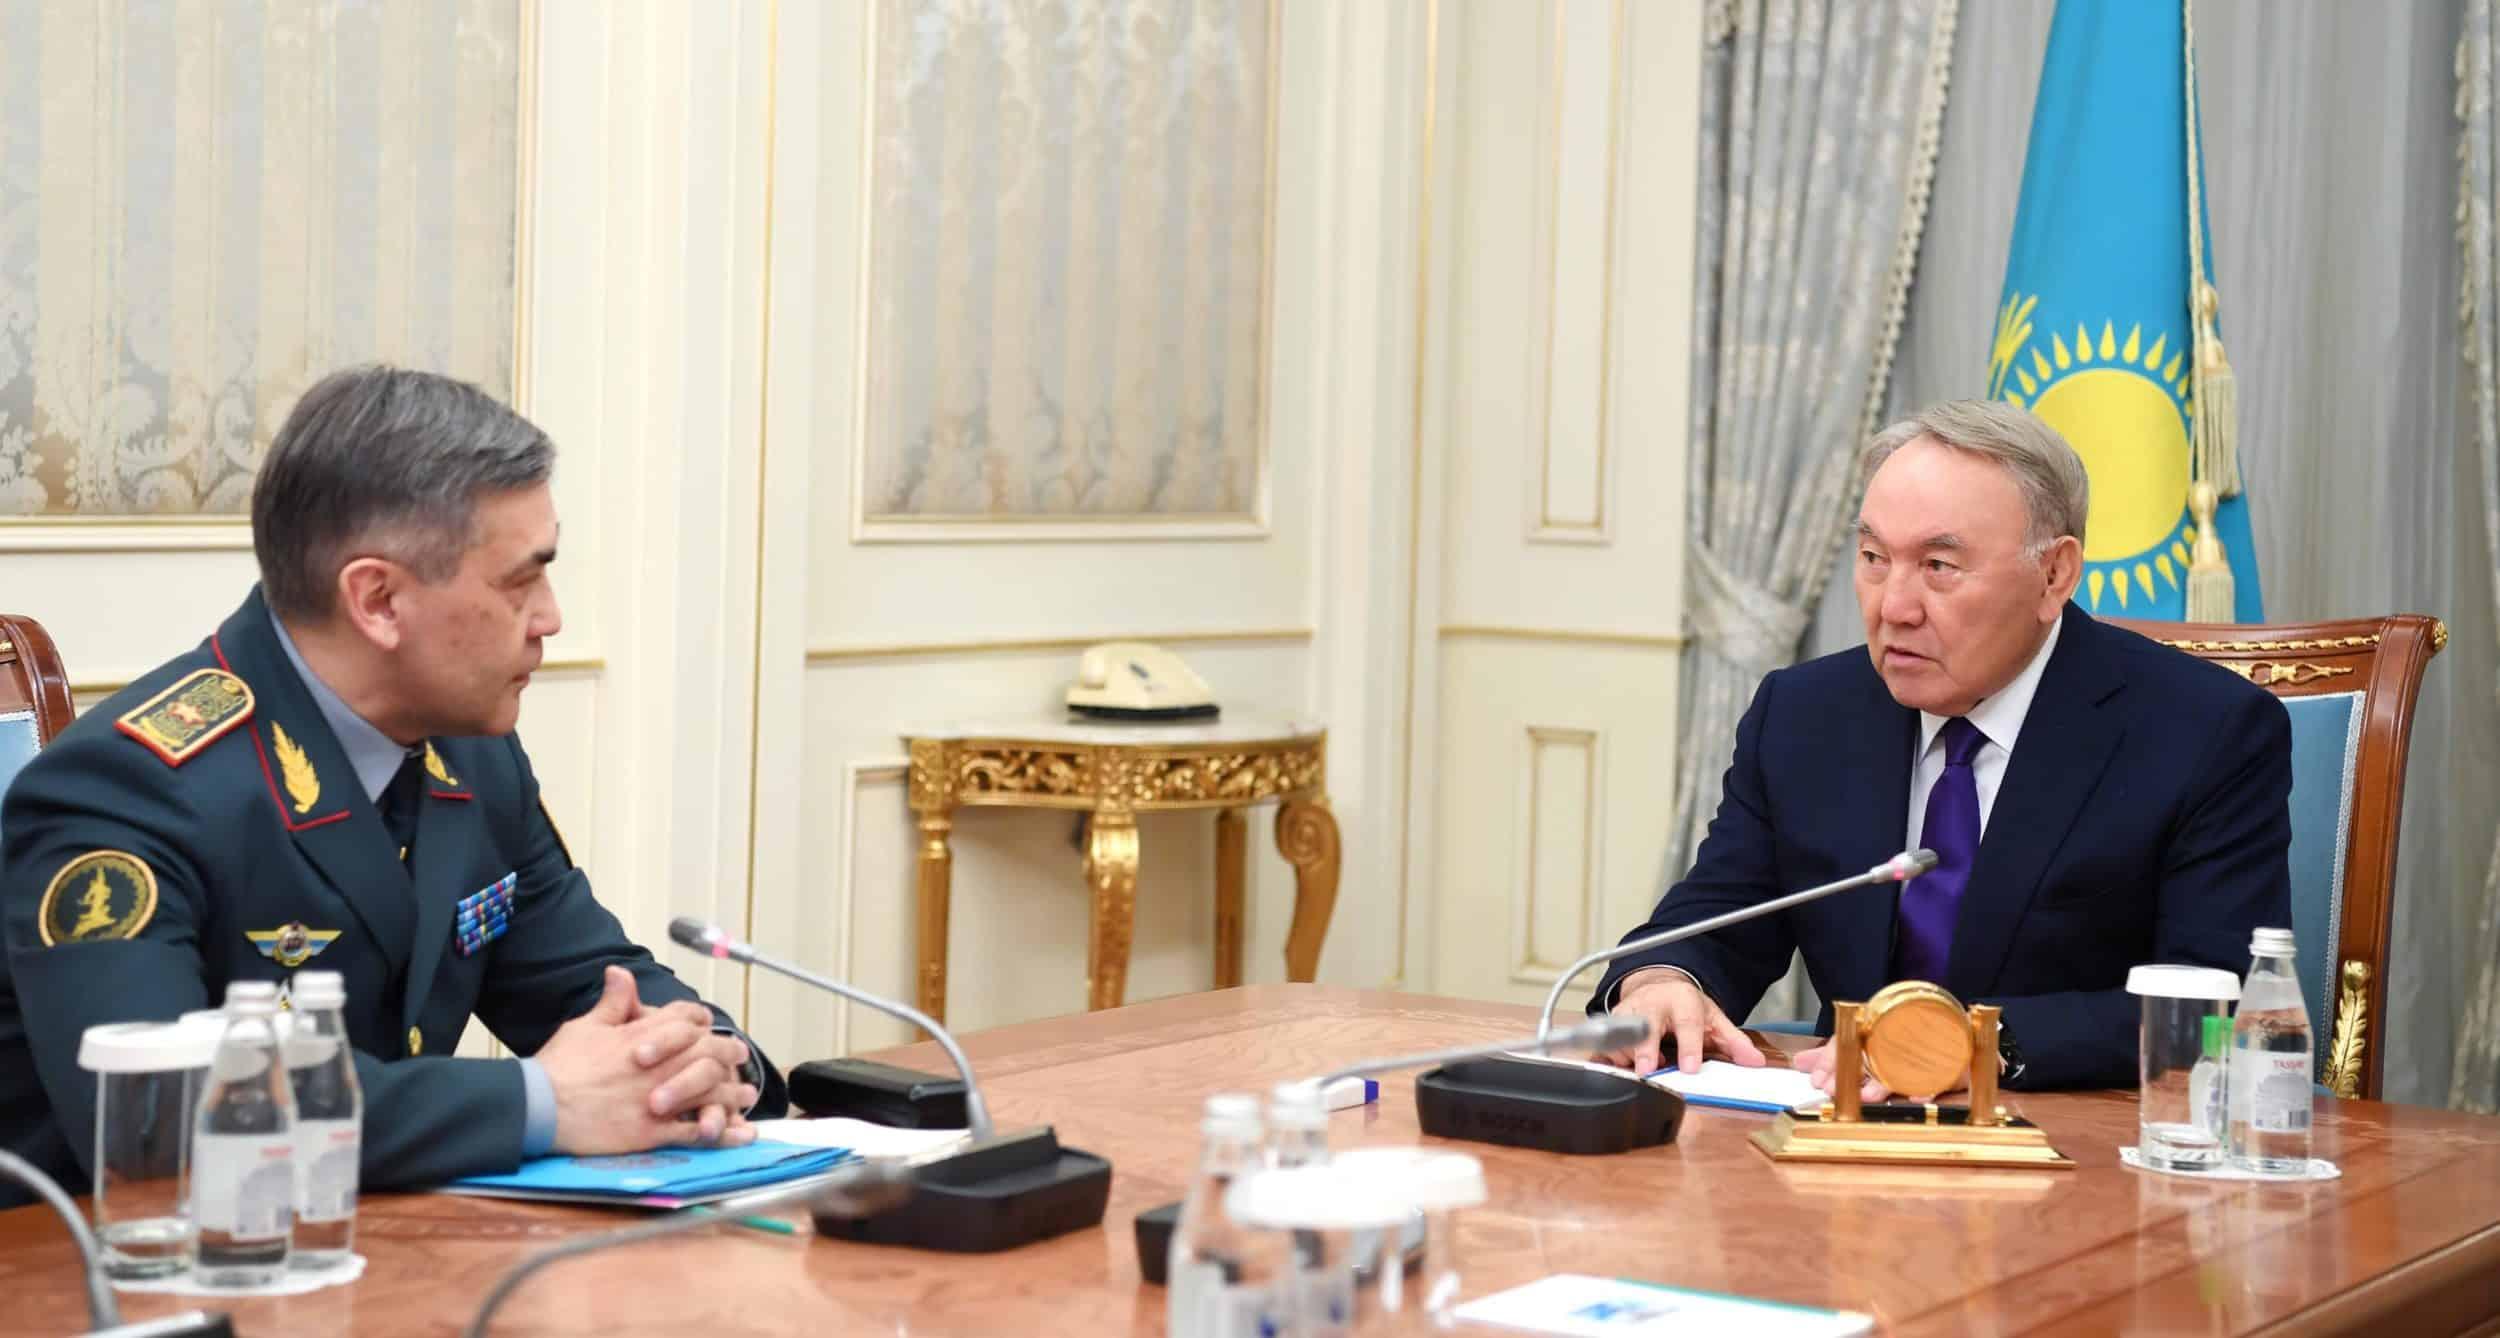 Нұрсұлтан Назарбаев Қорғаныс министрімен кездесті